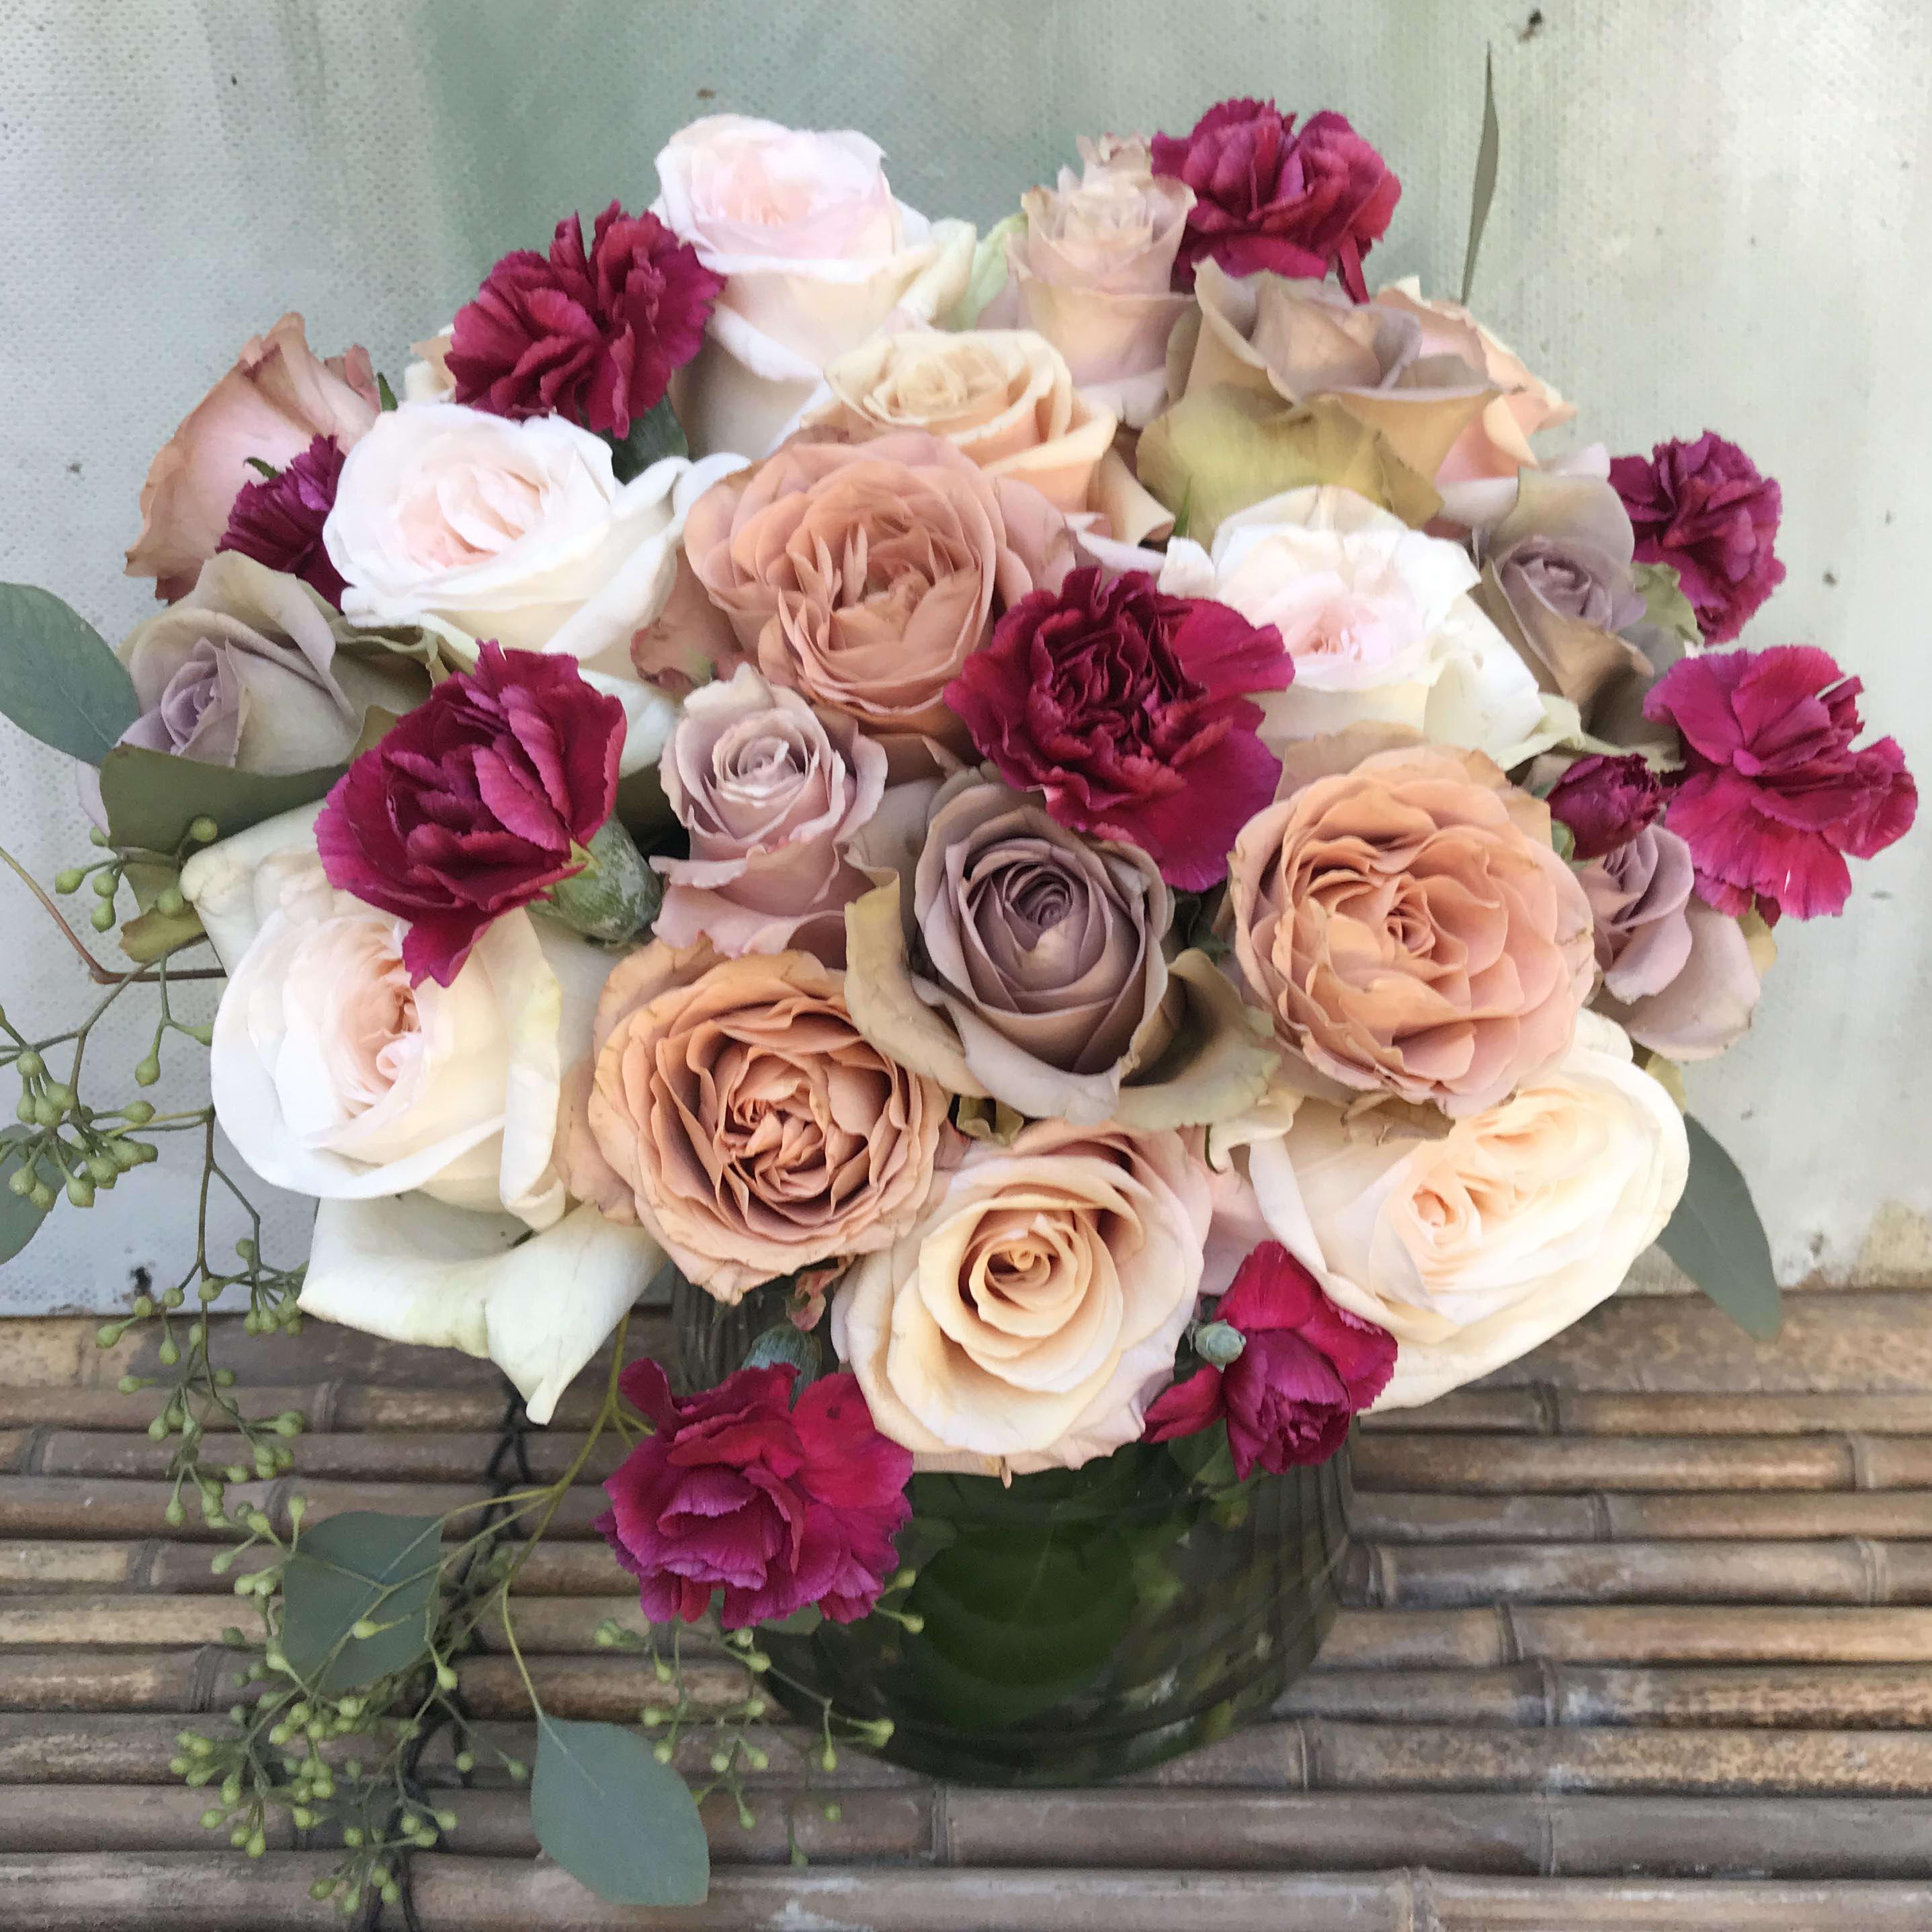 Roses Galore Valentine S Arrangement In Glendale Ca Blomst Los